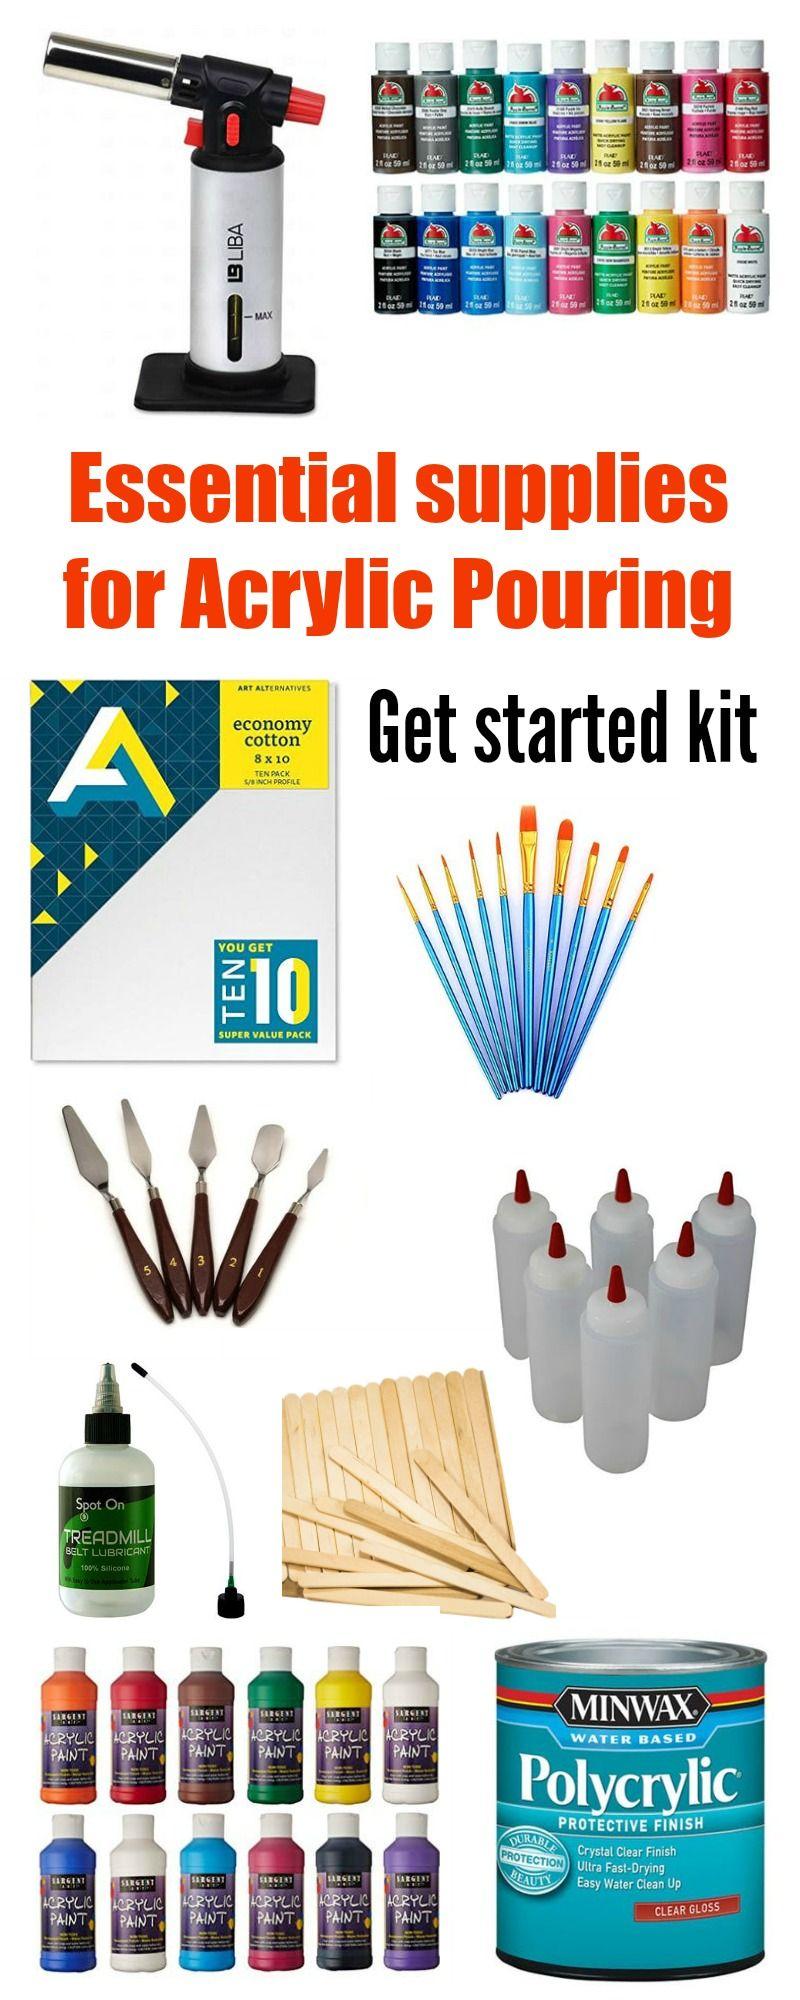 Acrylic Pouring Acrylicpouring Acrylic Pouring Art